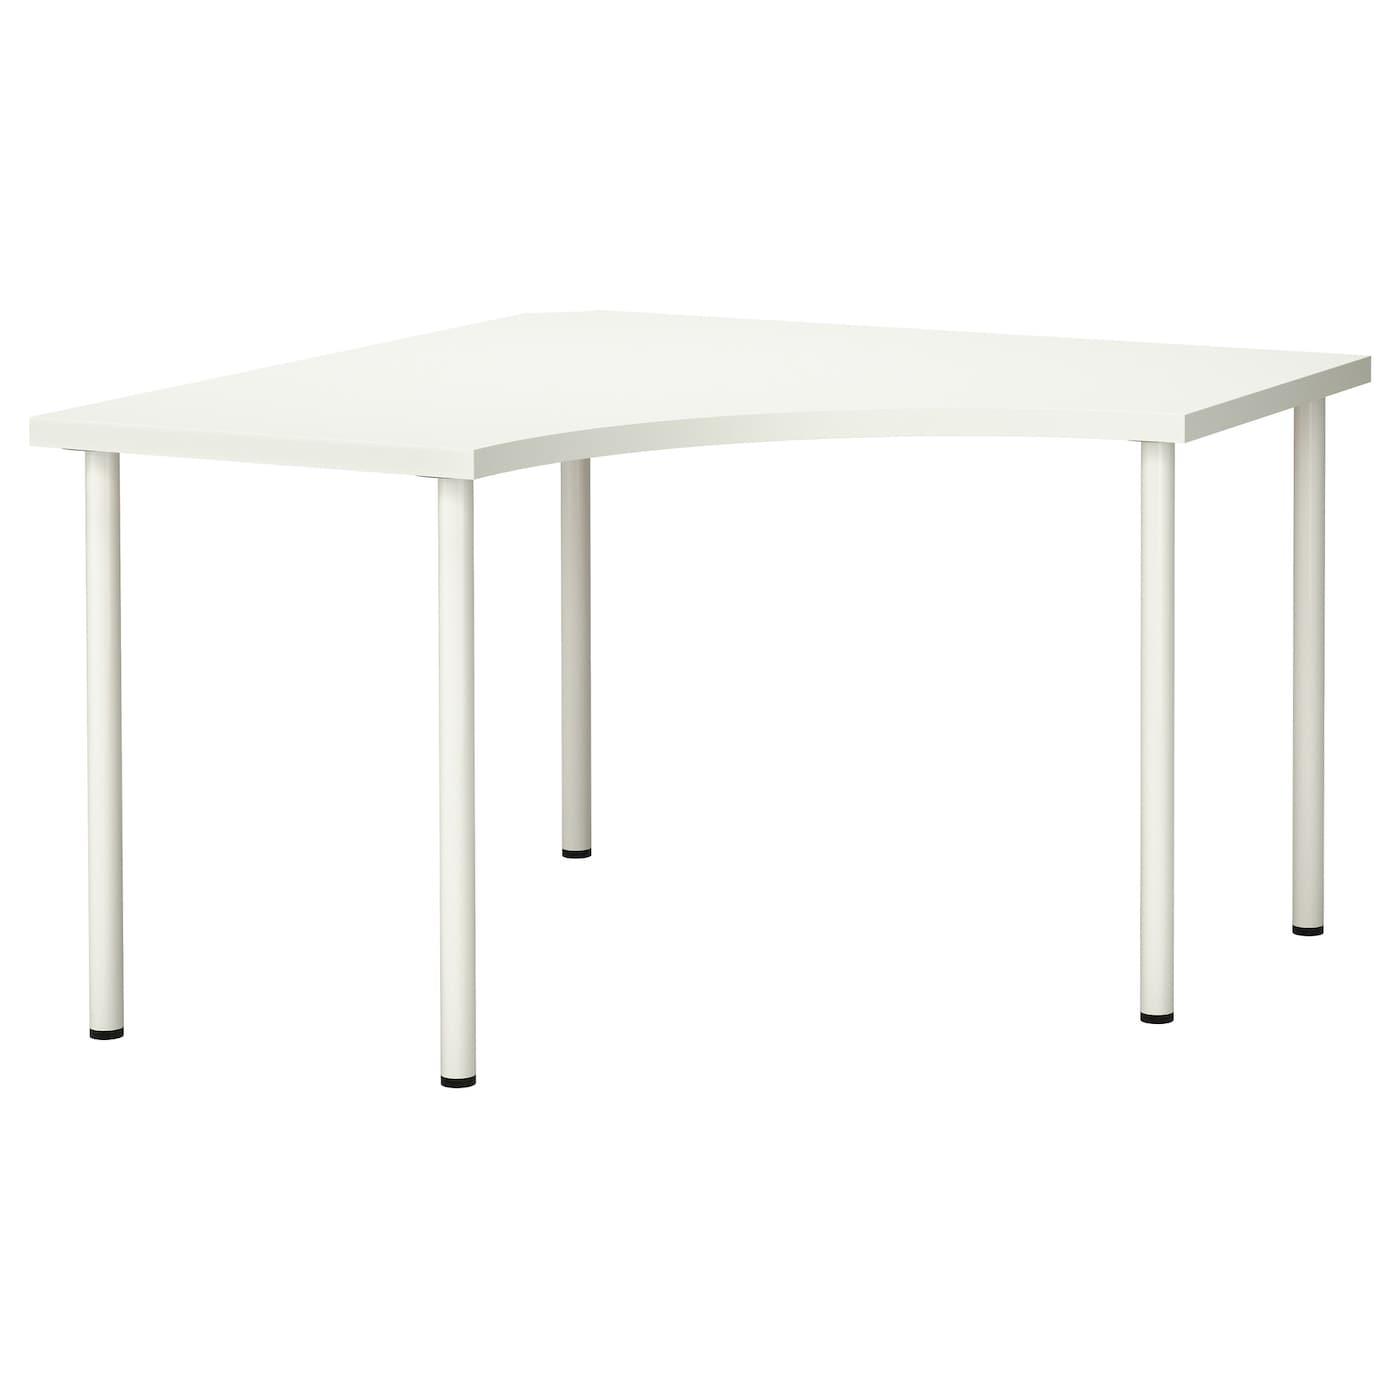 Workstation desks - IKEA